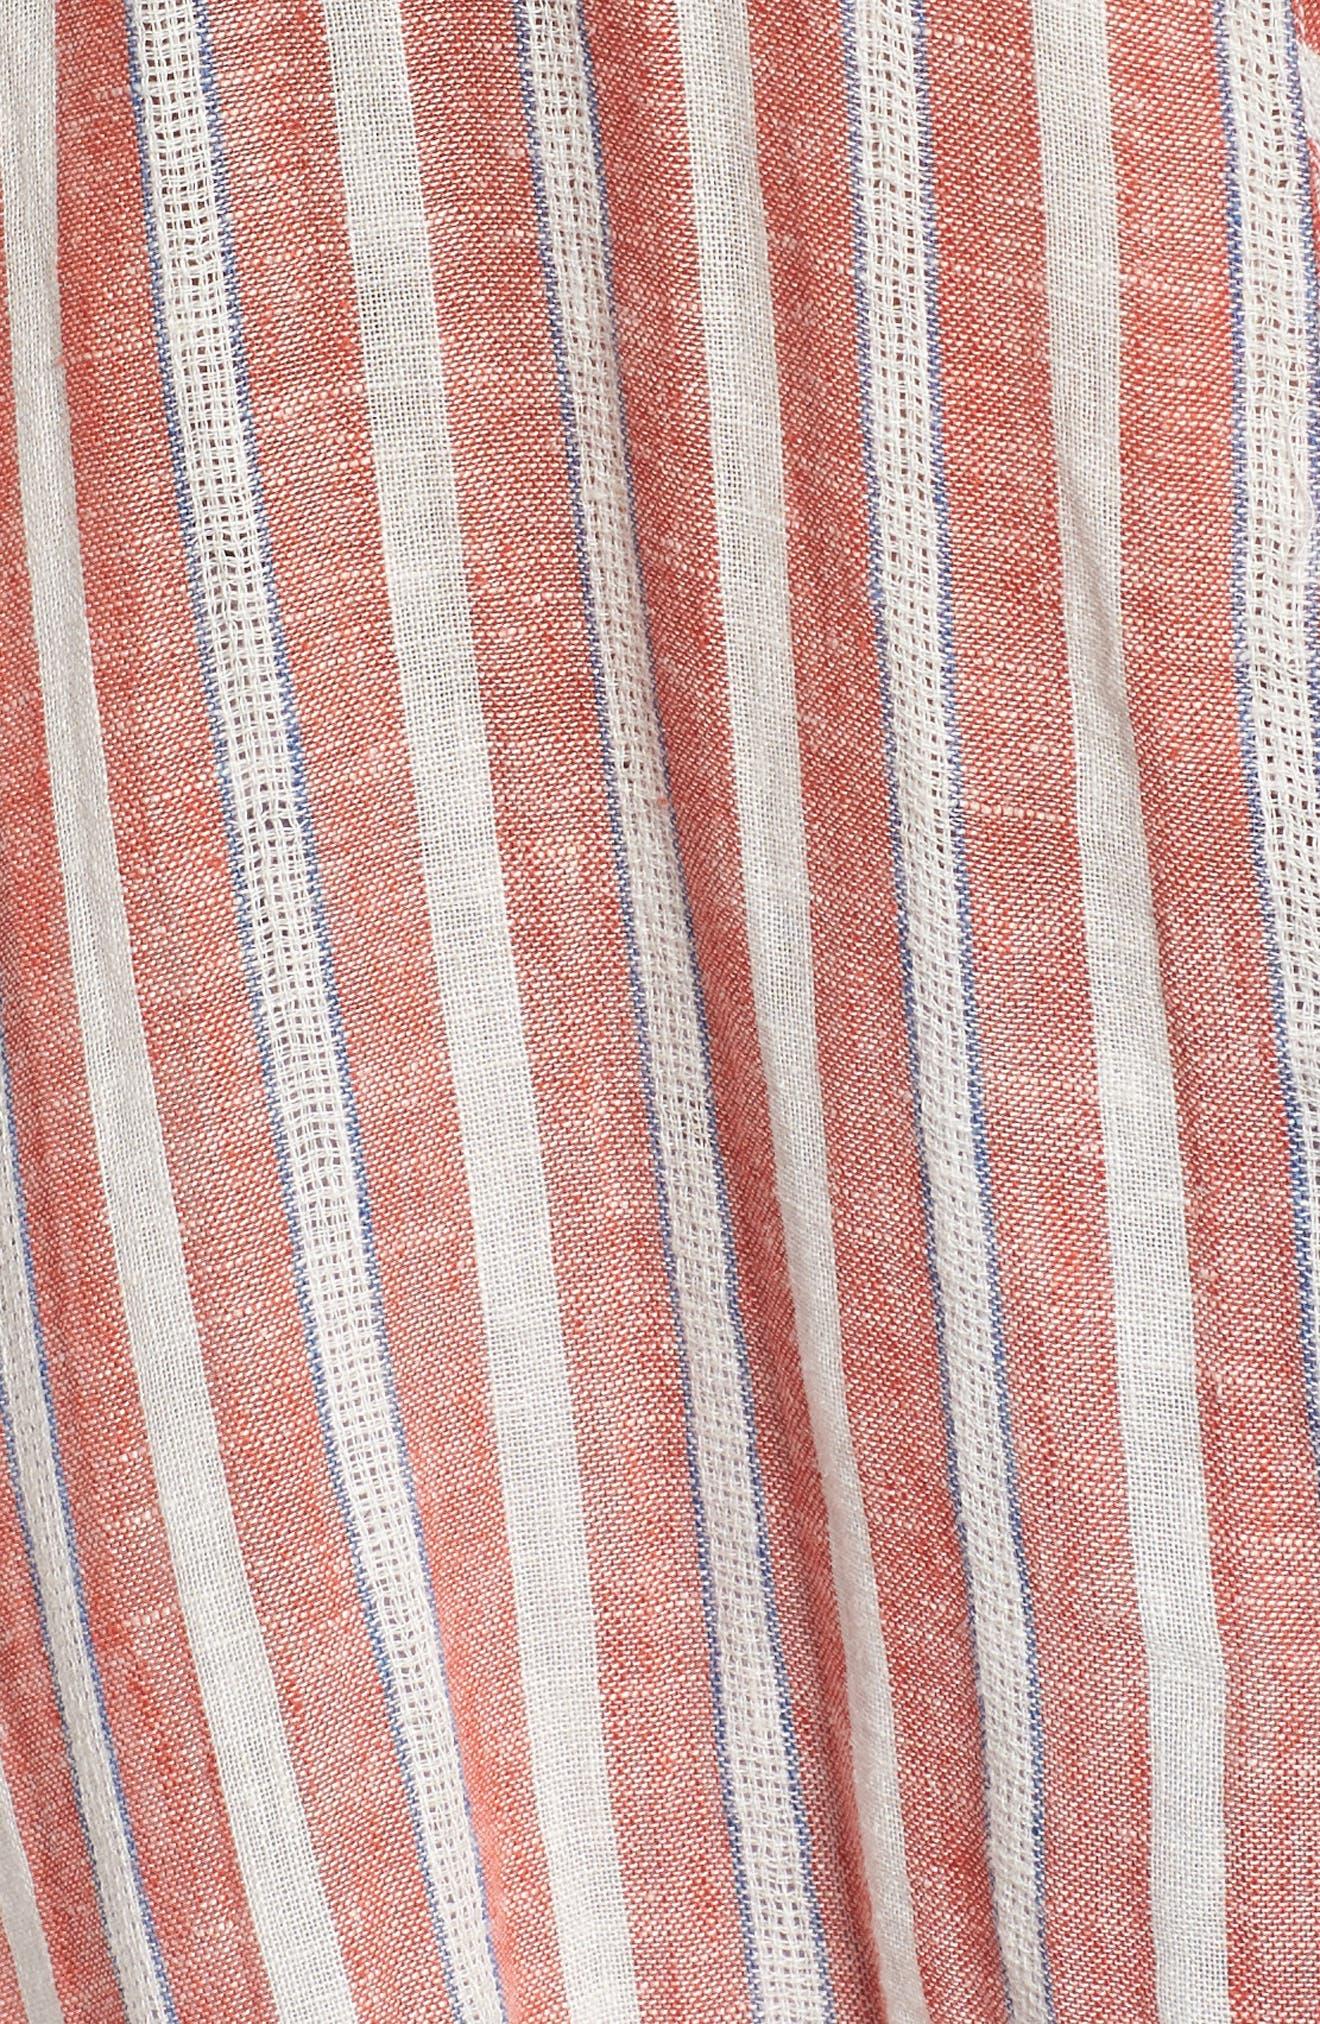 Tie Back Stripe Shirt,                             Alternate thumbnail 6, color,                             Red Multi